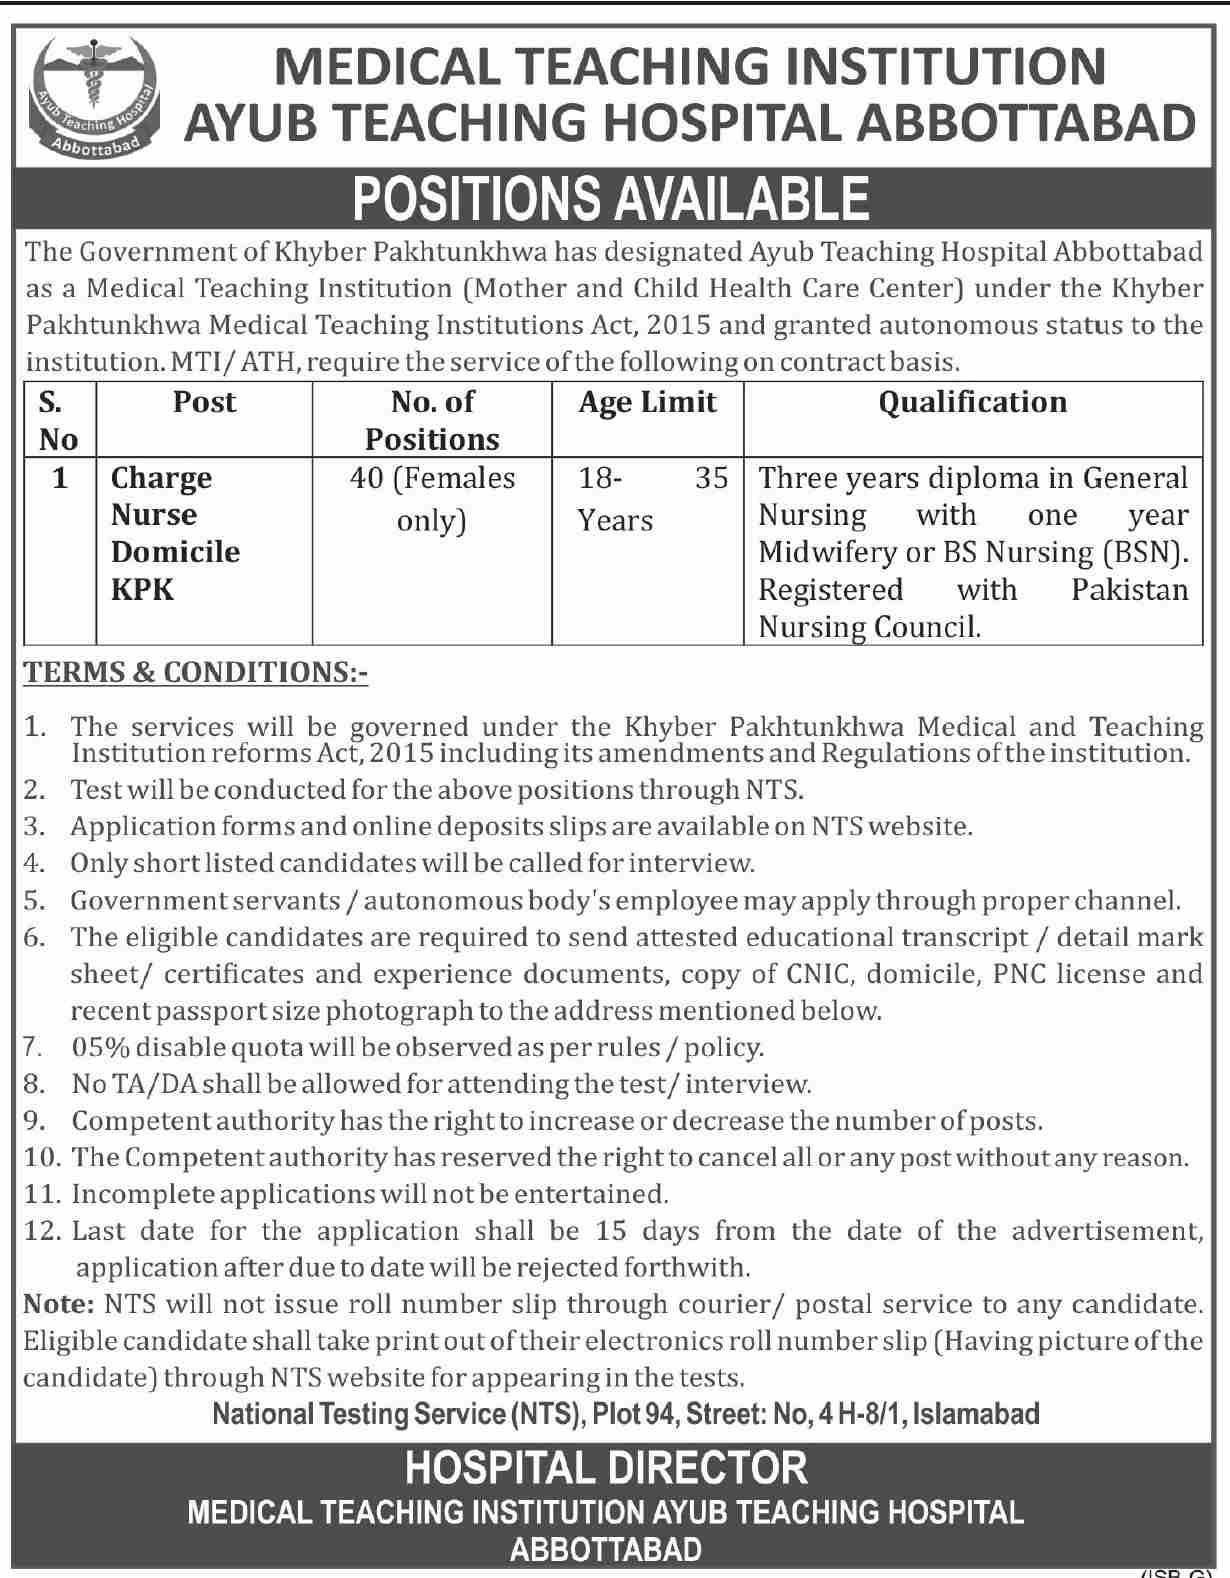 Ayub Teaching Hospital Abbottabad Charge Nurse Jobs NTS Form Roll No Slip